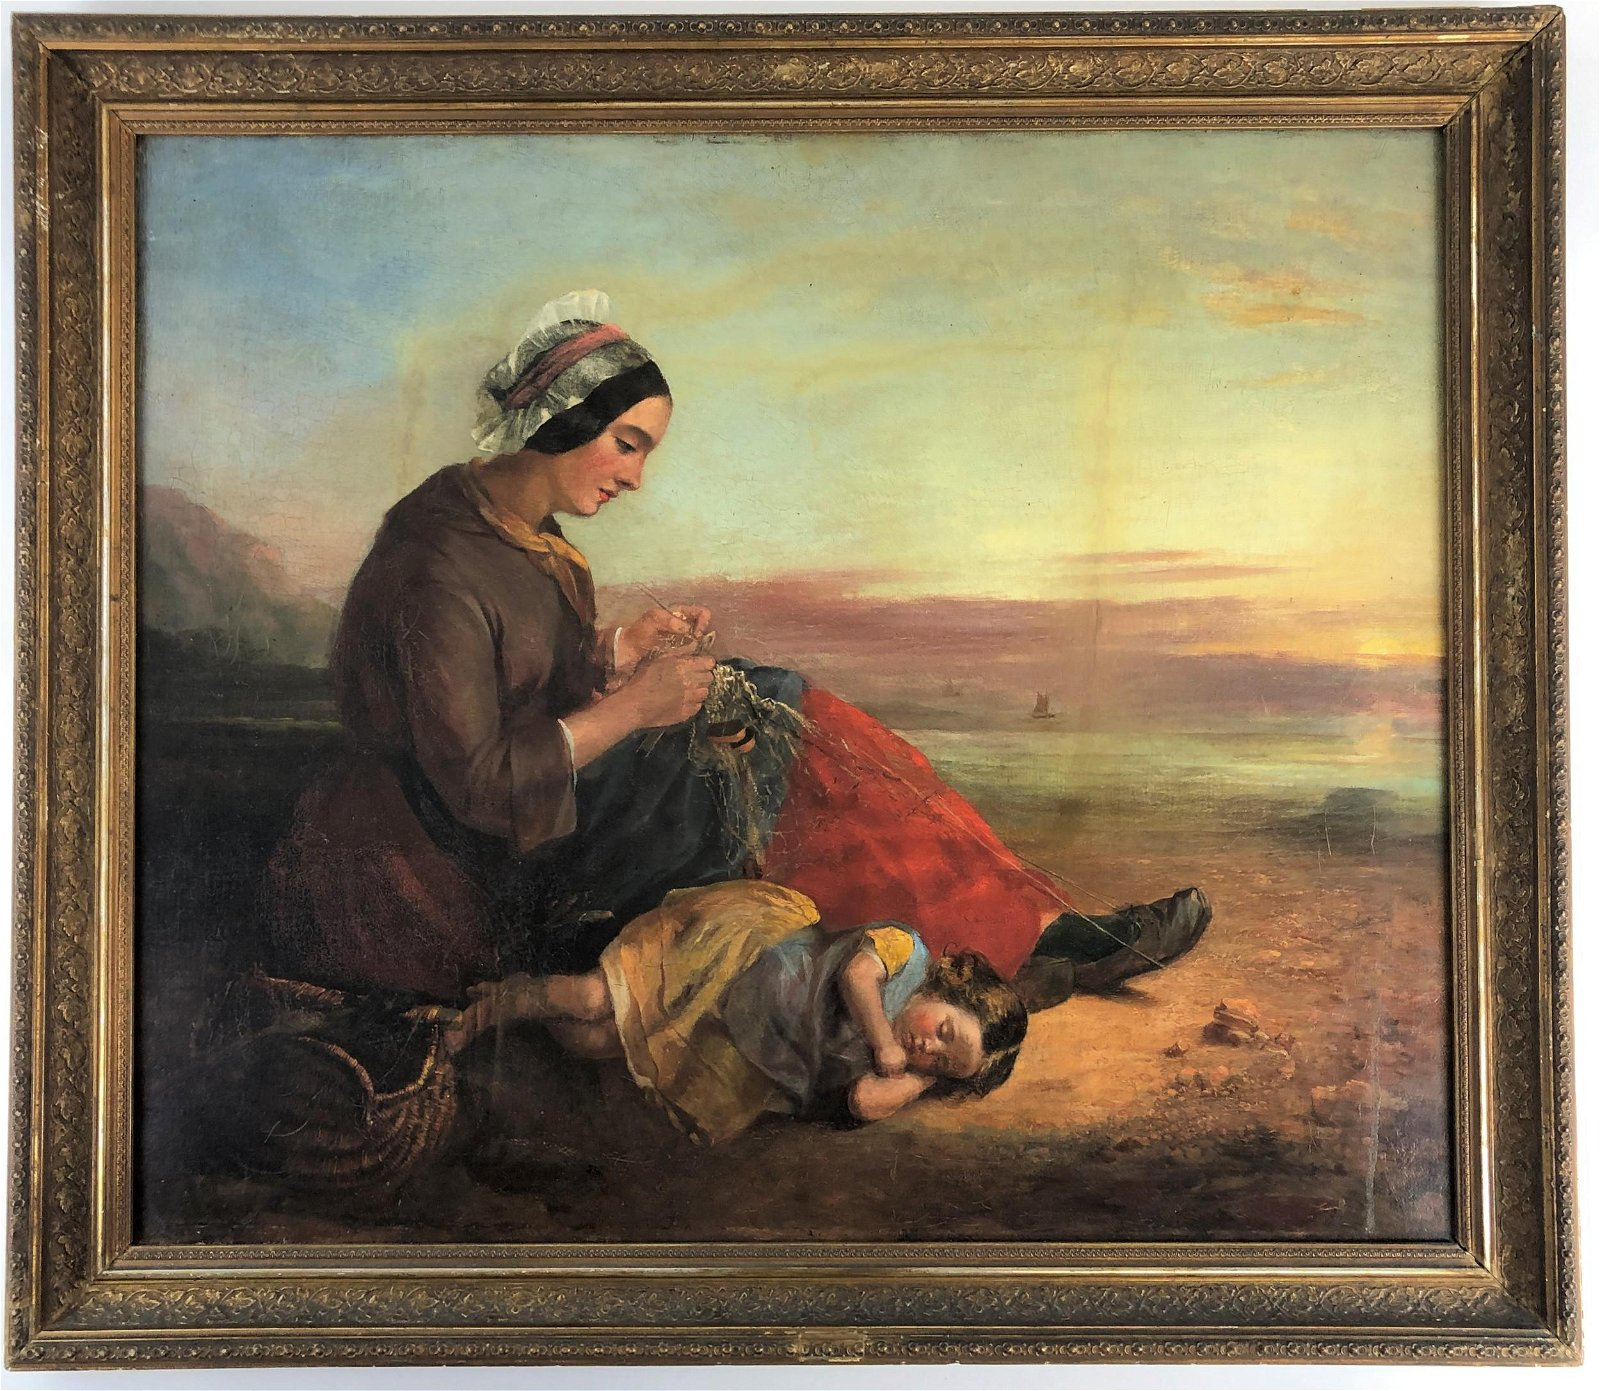 James Curnock (British, 1812-1862), Oil on Canvas